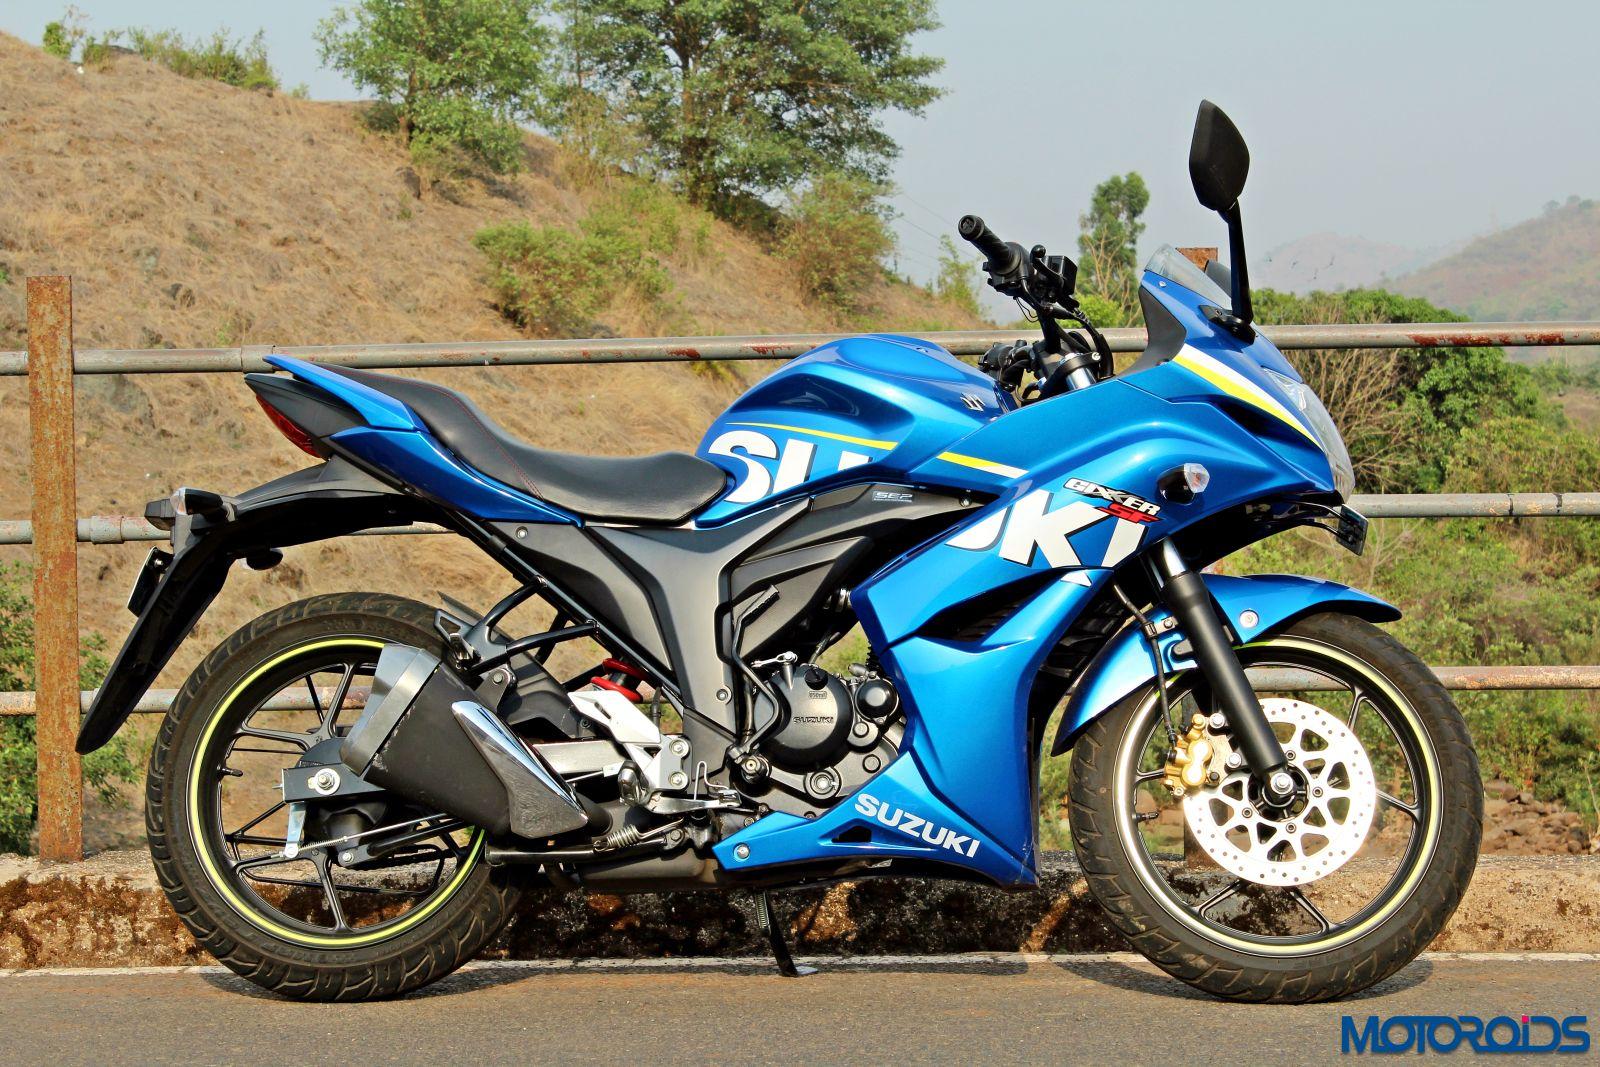 How Much Is A New Suzuki Motorcycle